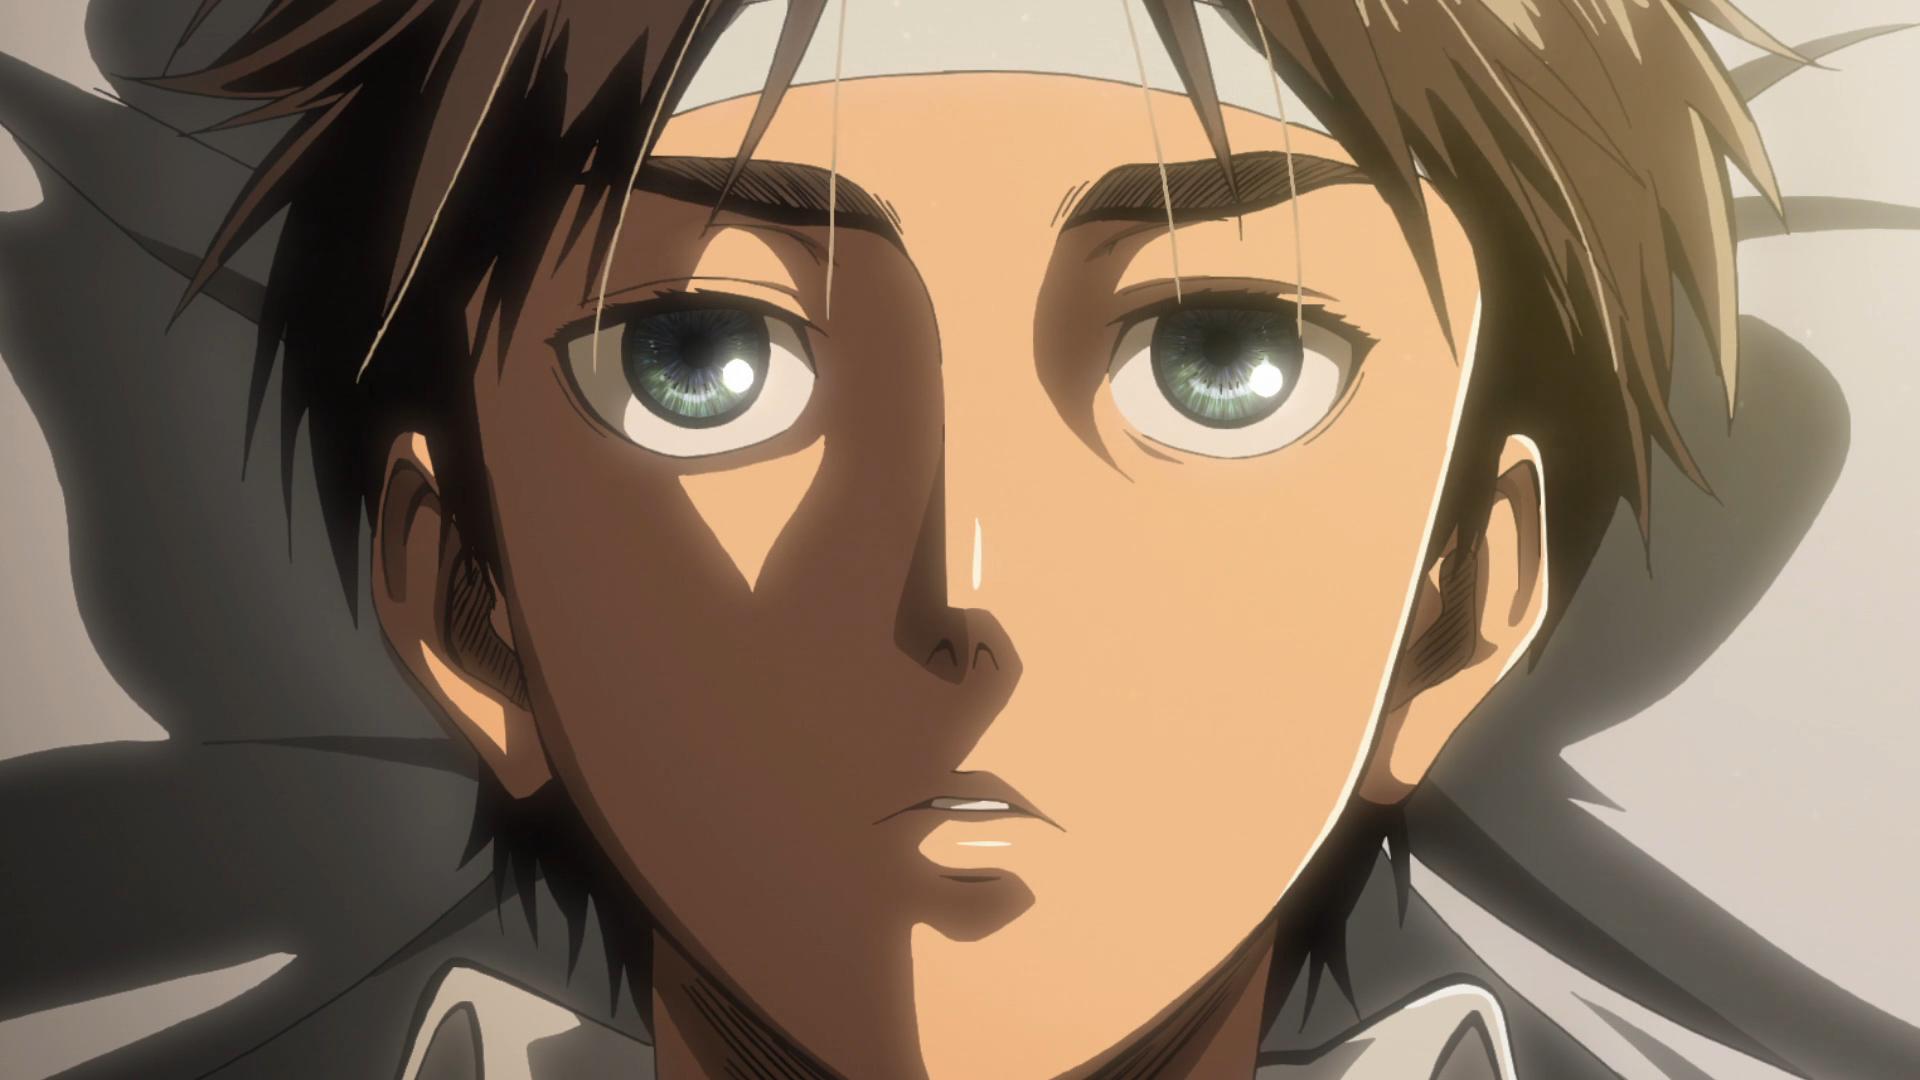 Review Discussion About Shingeki No Kyojin Season 2 The Chuuni Corner Season 1 episode 5, first battle: shingeki no kyojin season